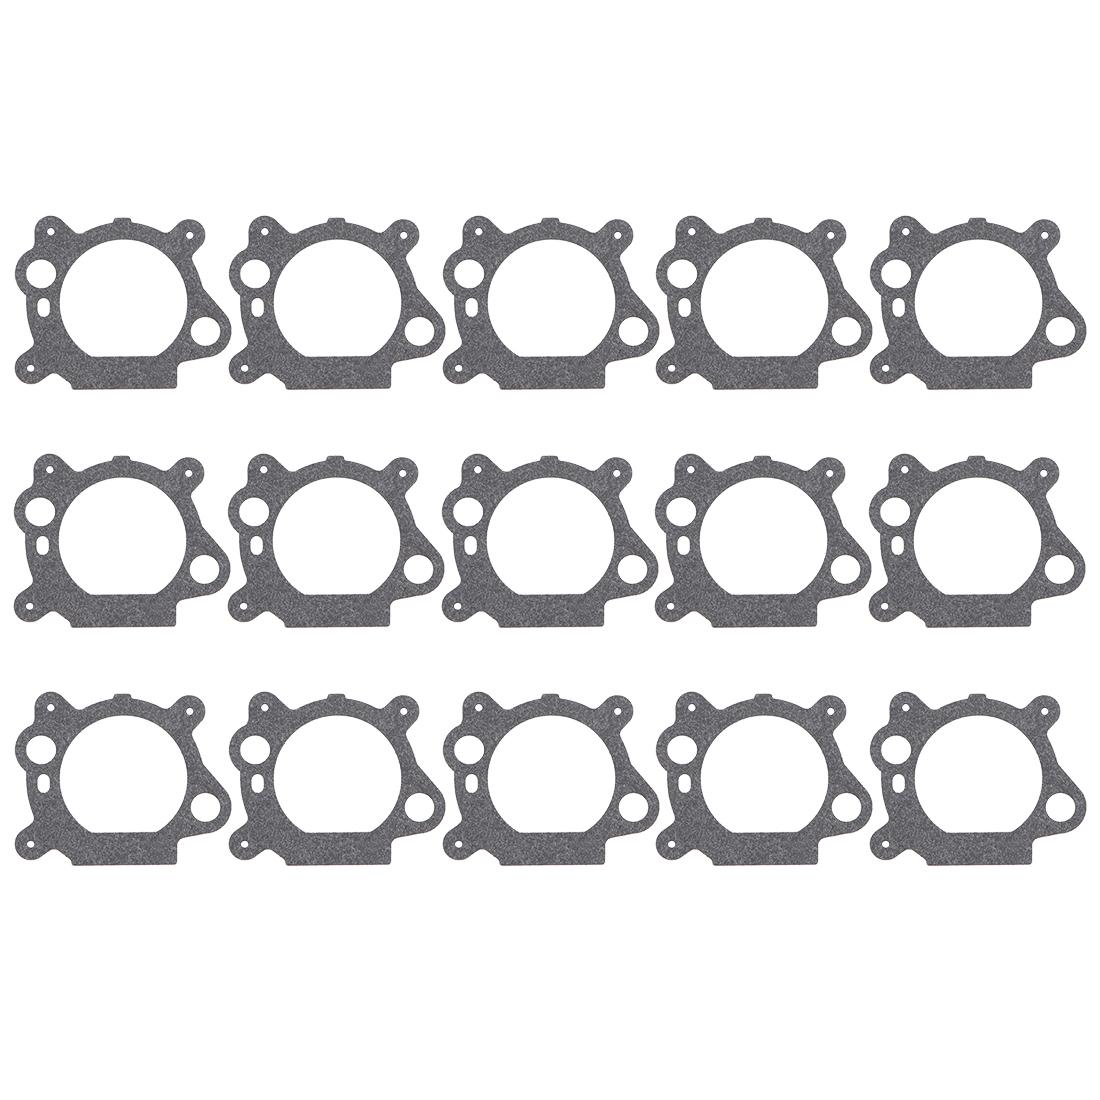 795629 Carburetor Rebuild Kit for Briggs and Stratton 272653 272653S Carb 15pcs